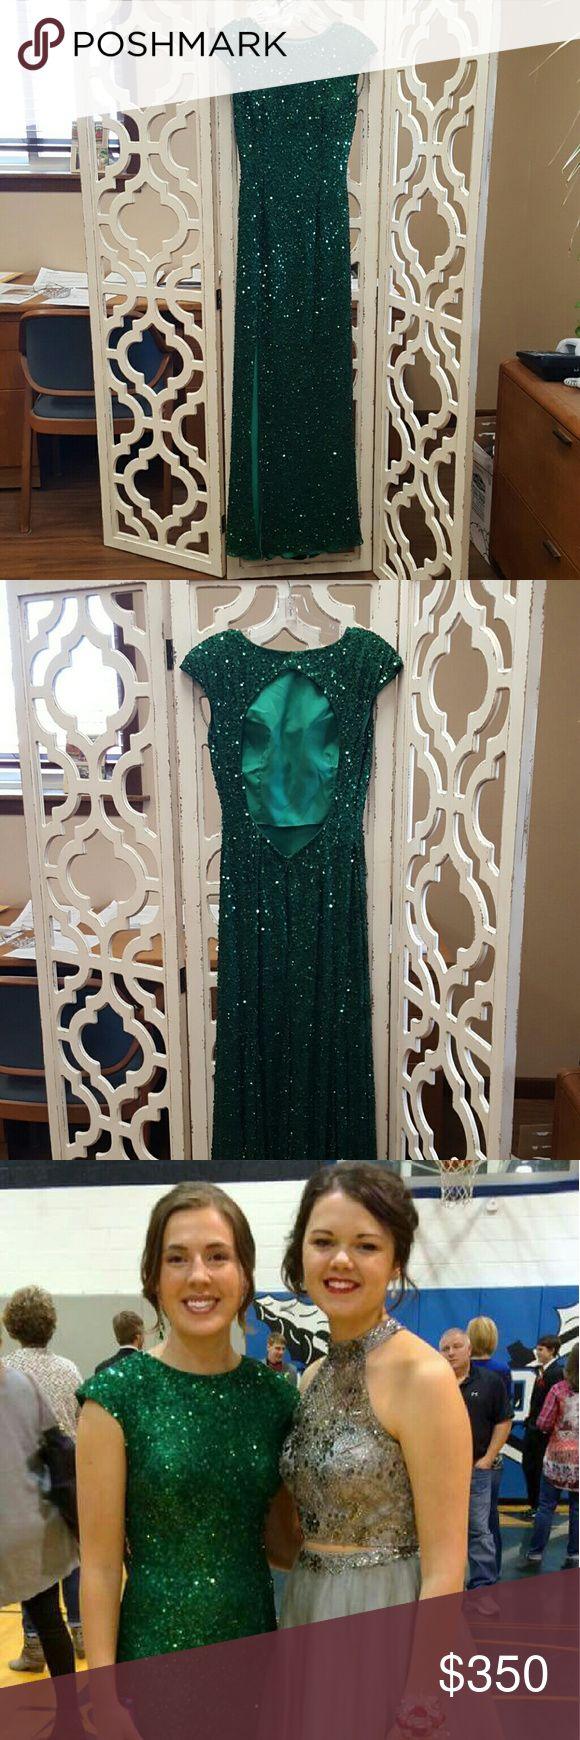 Shail K Prom Dress Emerald Green Shail K Prom Dress  Key Hole Back  Size 8  Only worn once  Leg slit that begins at the knee Shail K Dresses Prom